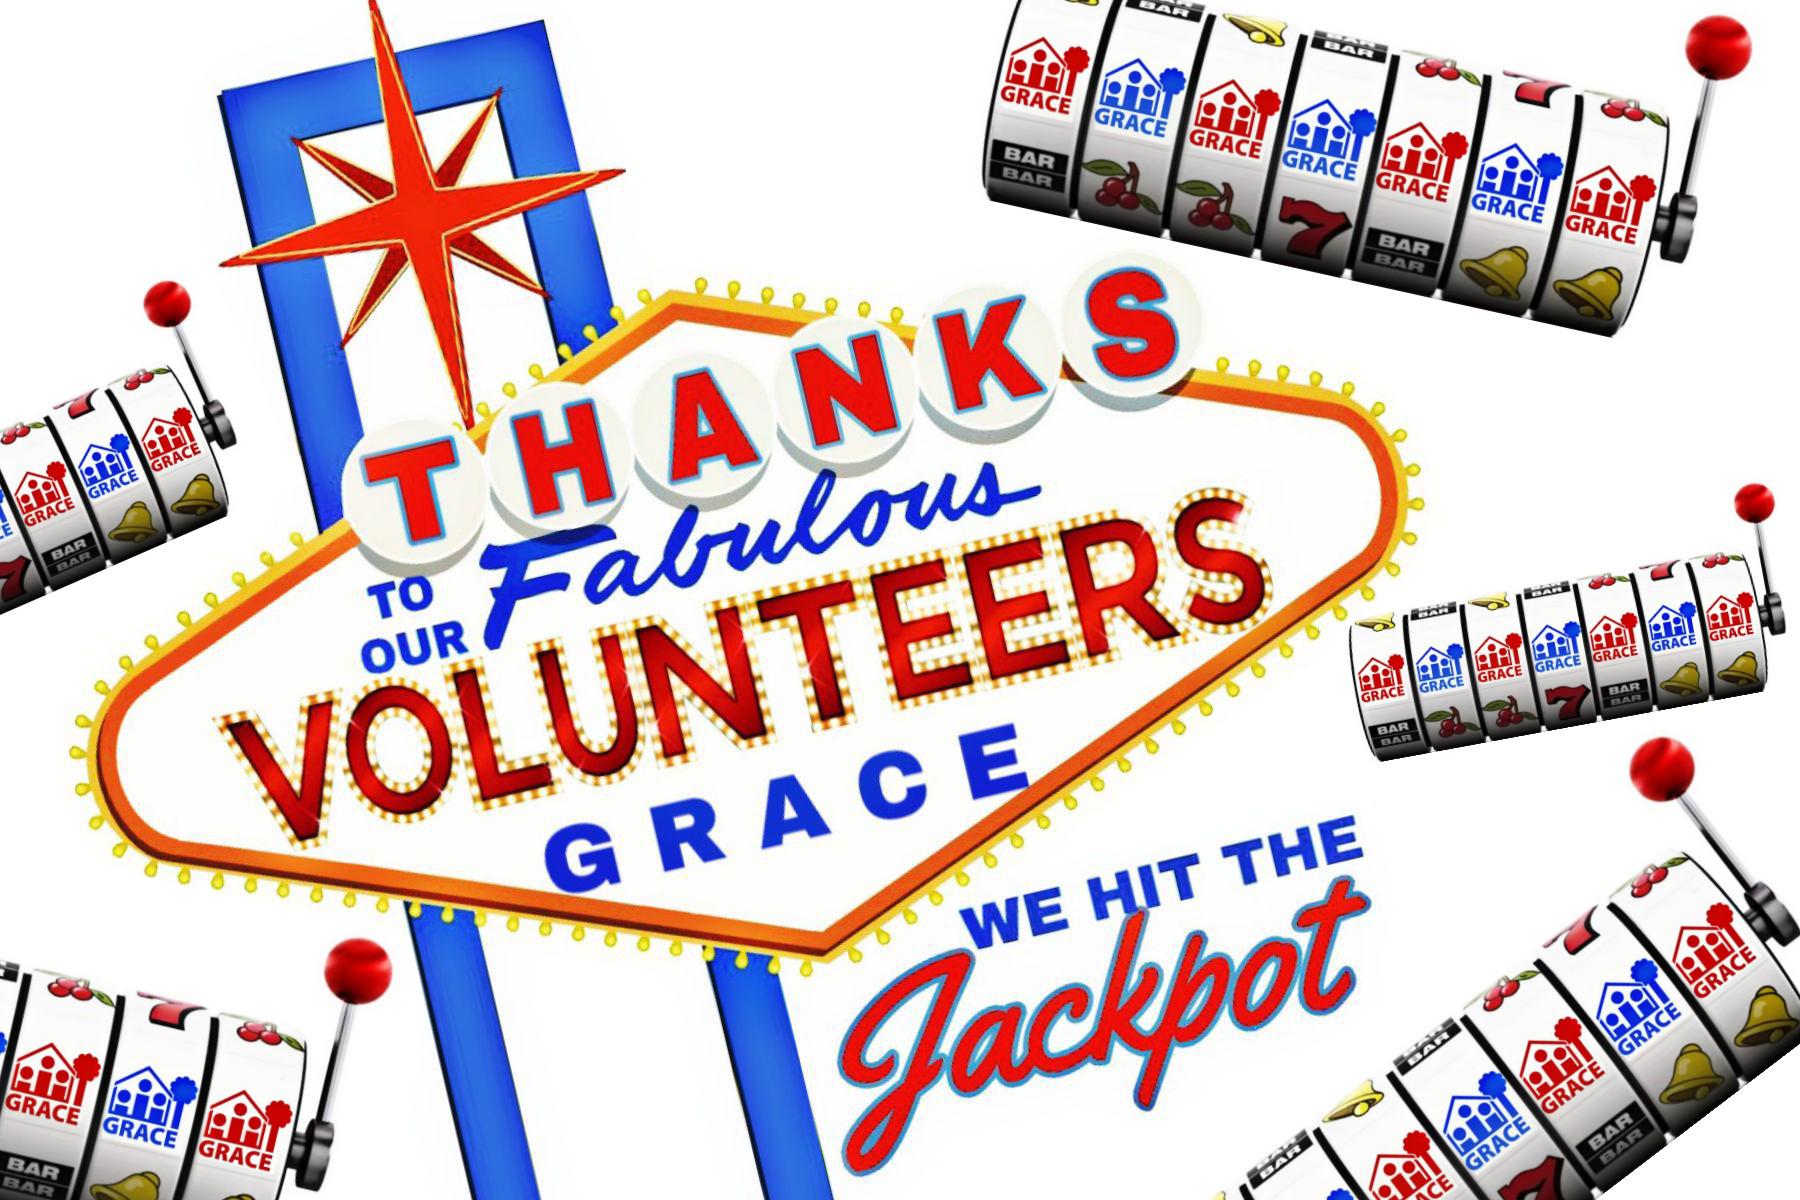 We won the jackpot clipart picture transparent 2019 GRACE Volunteer Appreciation Luncheon — We Hit the ... picture transparent